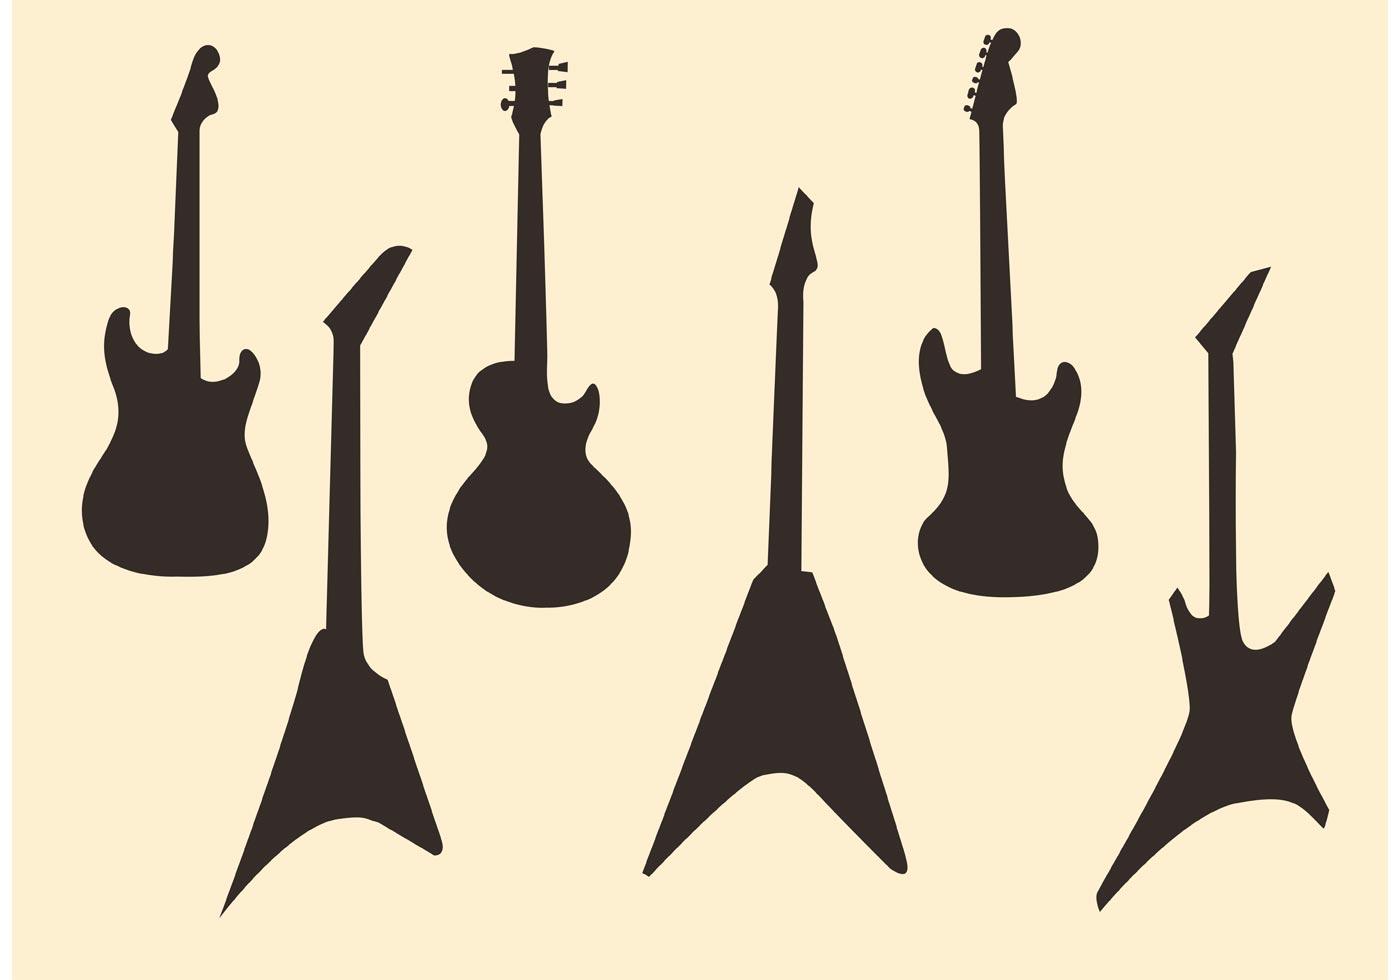 guitar free vector art 4299 free downloads rh vecteezy com guitar factory guitar factory uk